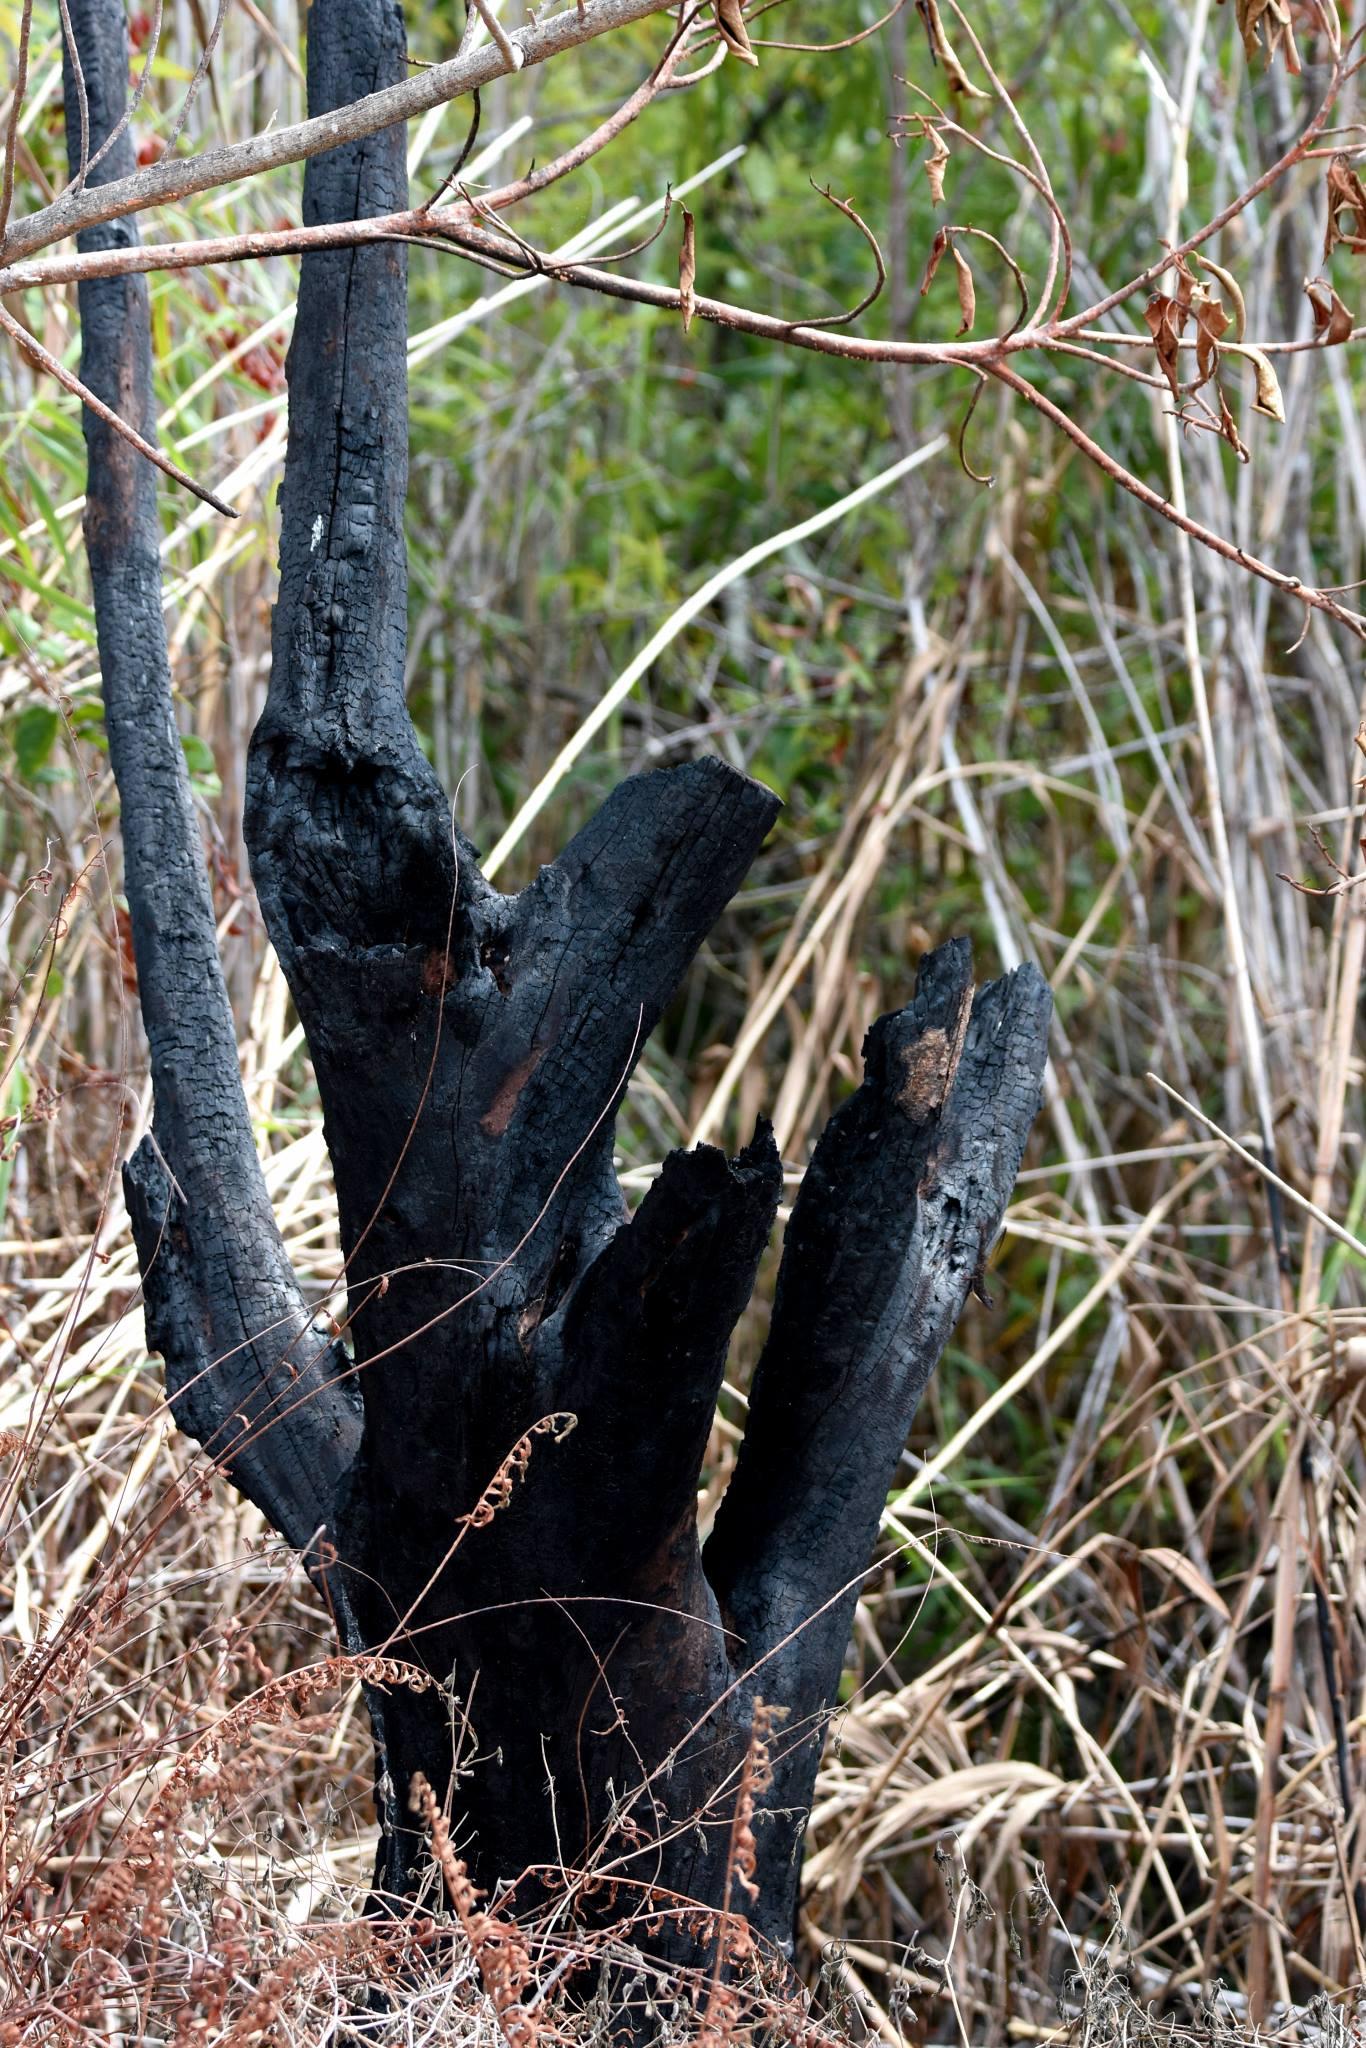 fire in the everglades, everglades ecology, macks fish camp, gladesmen culture